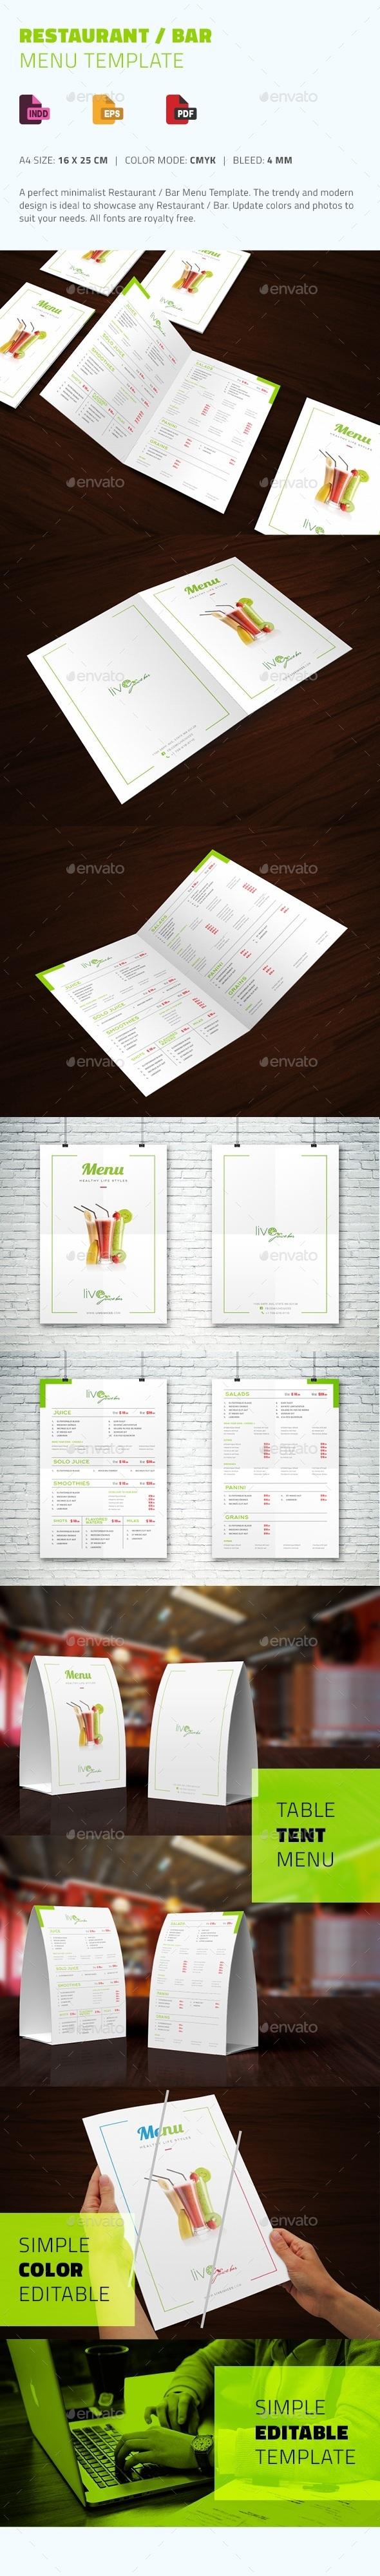 Restaurant / Bar Menu Template - Food Menus Print Templates